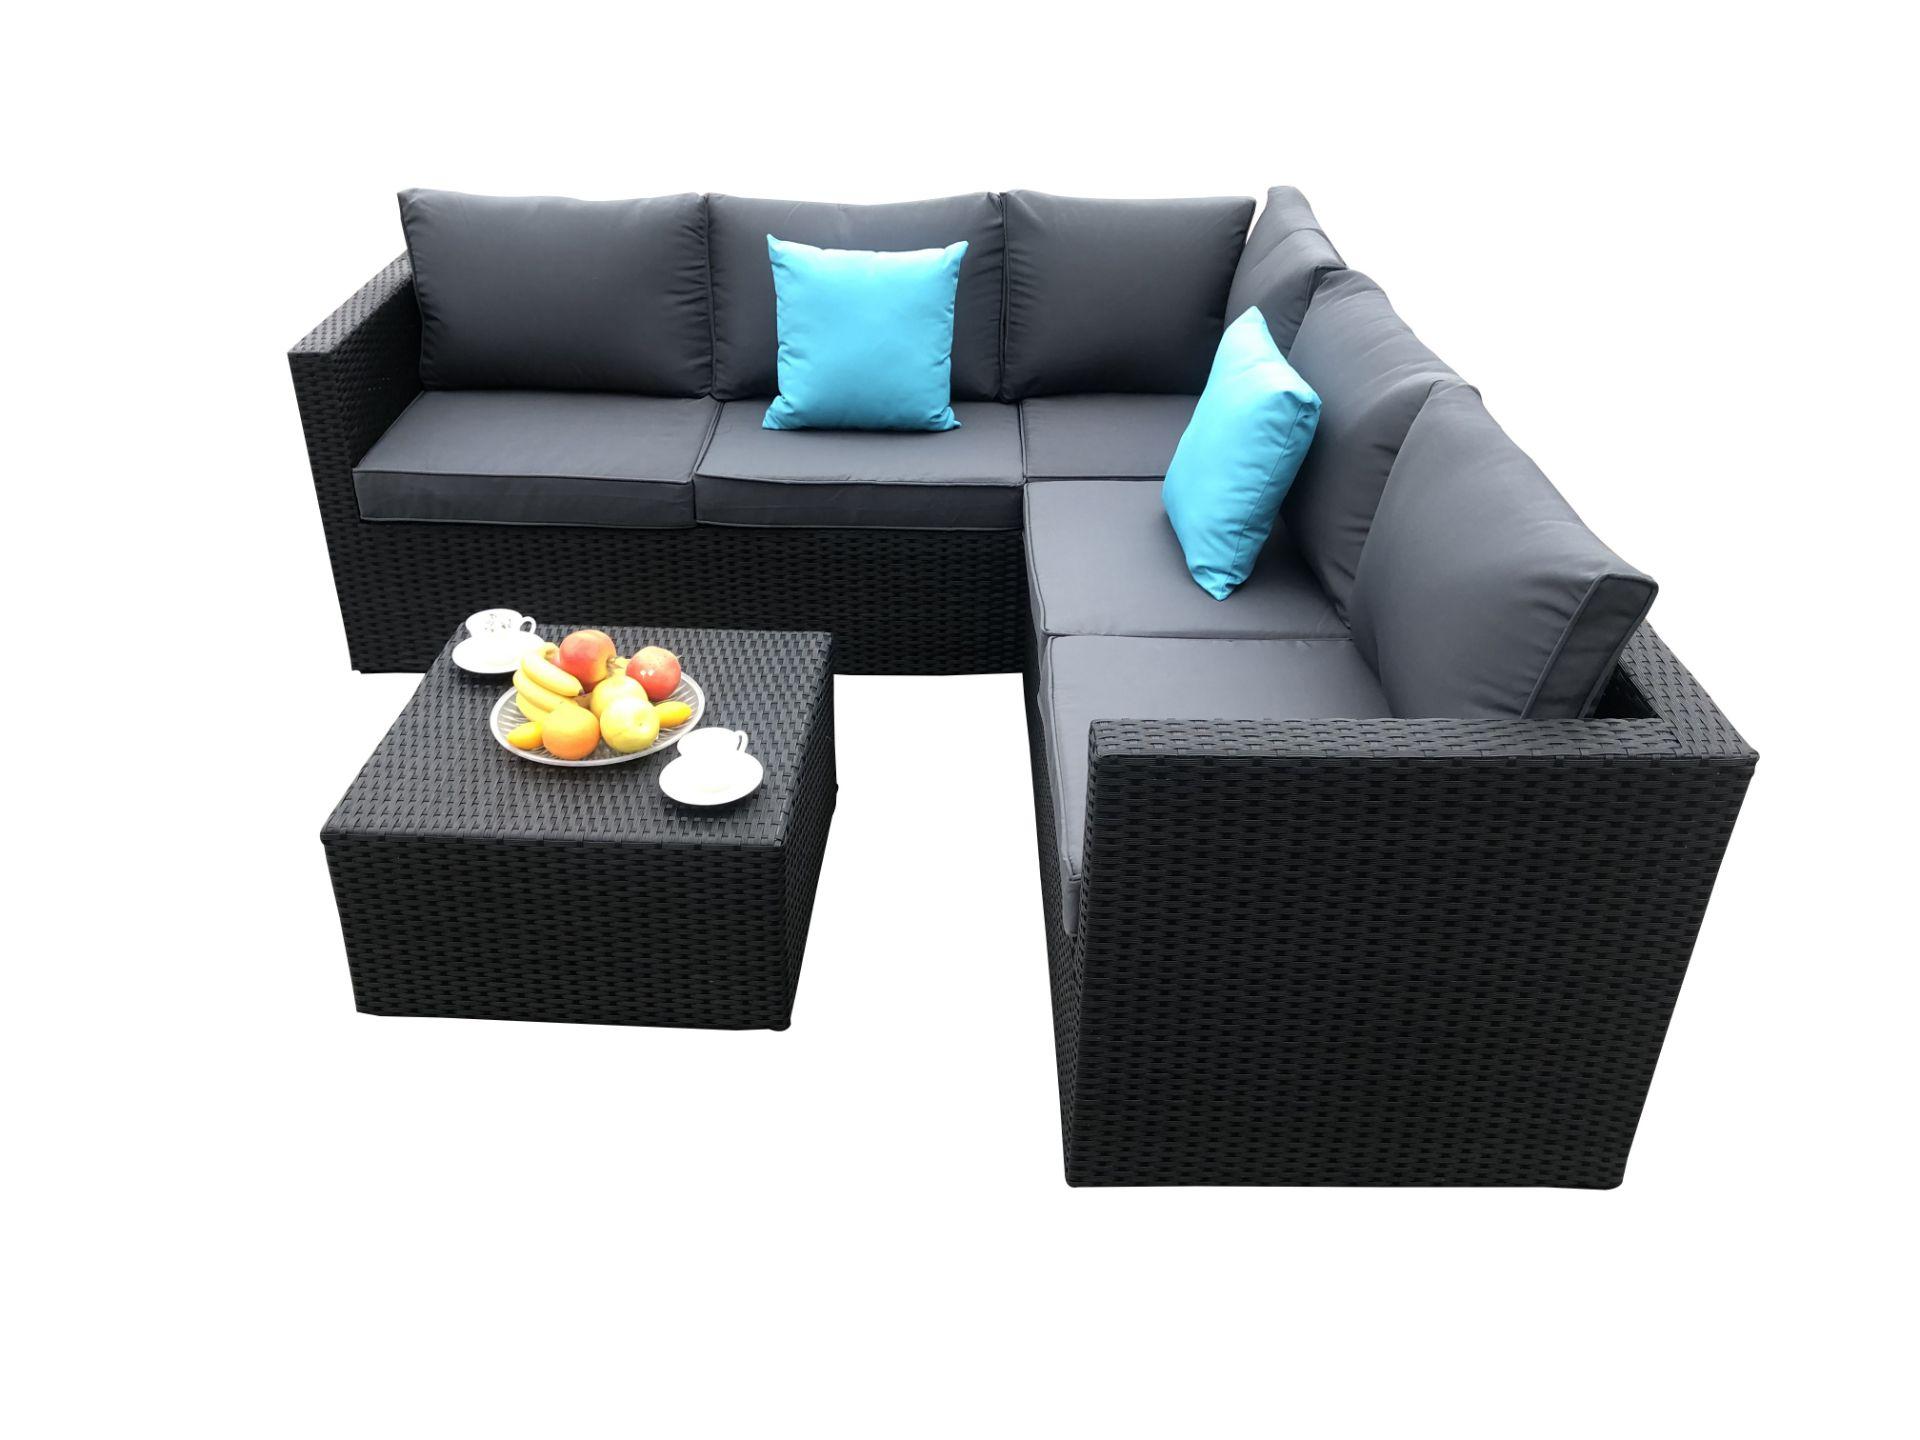 + VAT Brand New Chelsea Garden Company Six Seater Rattan Corner Sofa Set With Table - Steel Frame -